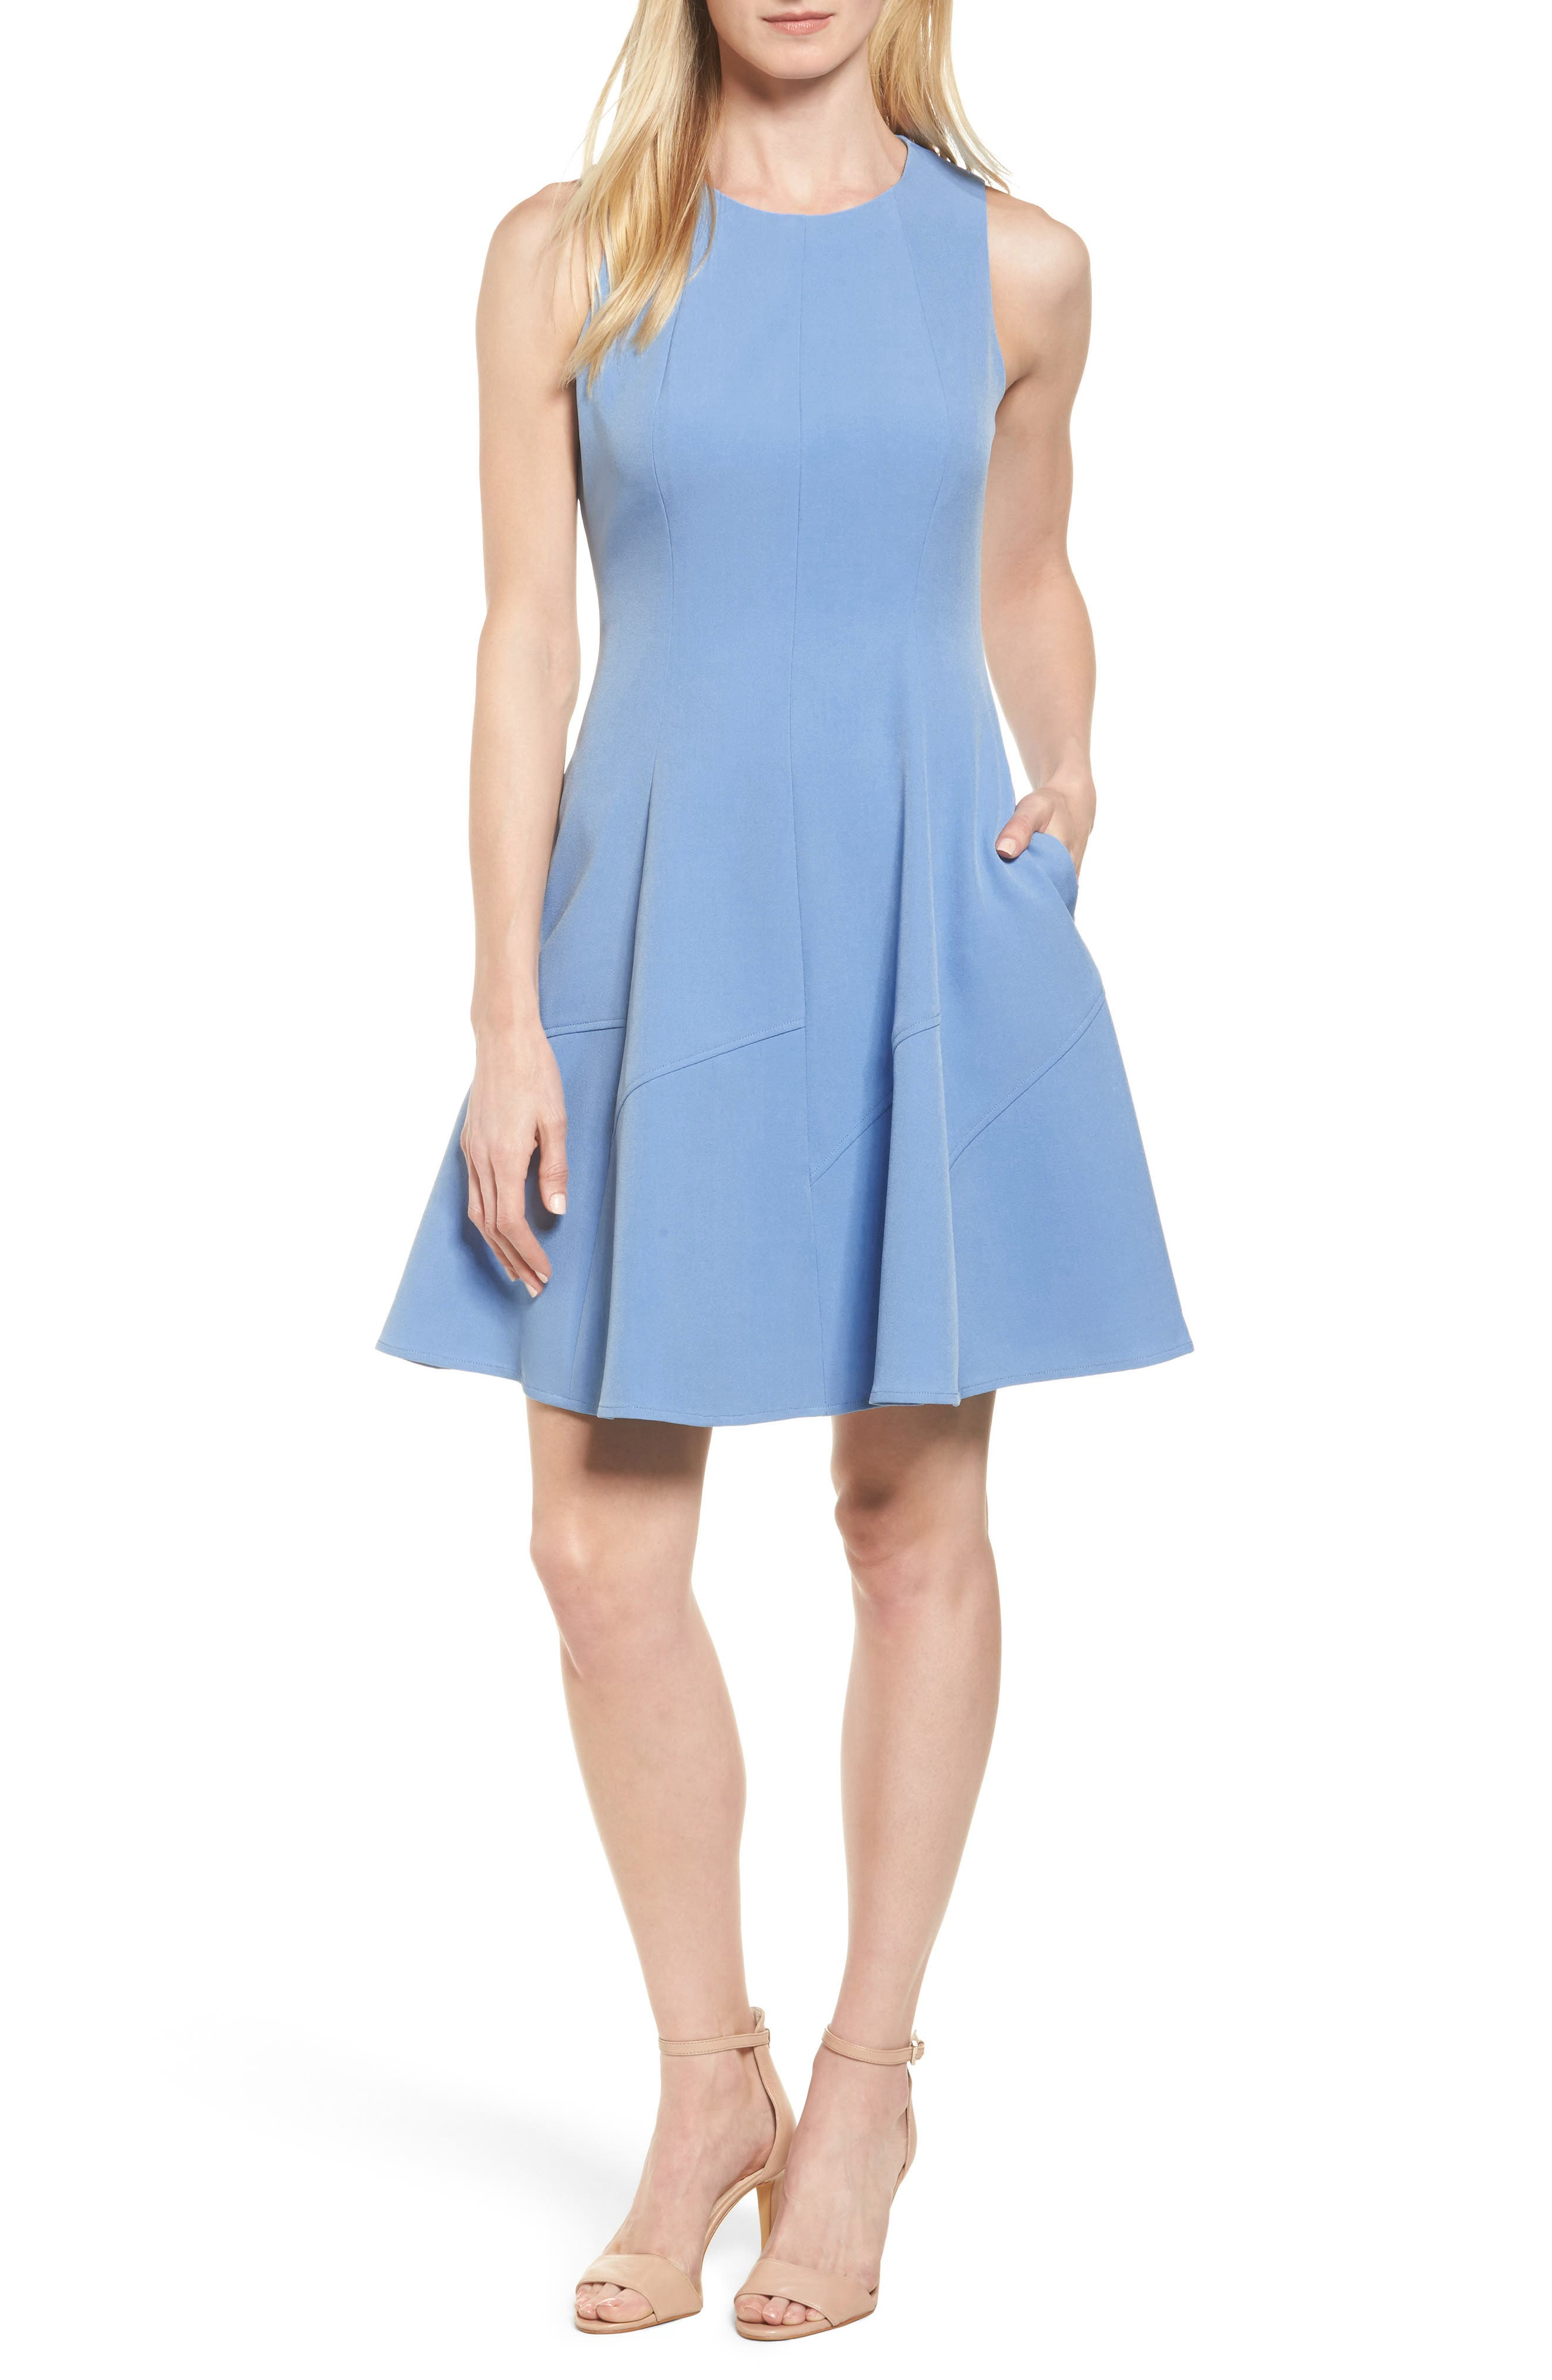 Main Image - Anne Klein Fit & Flare Dress